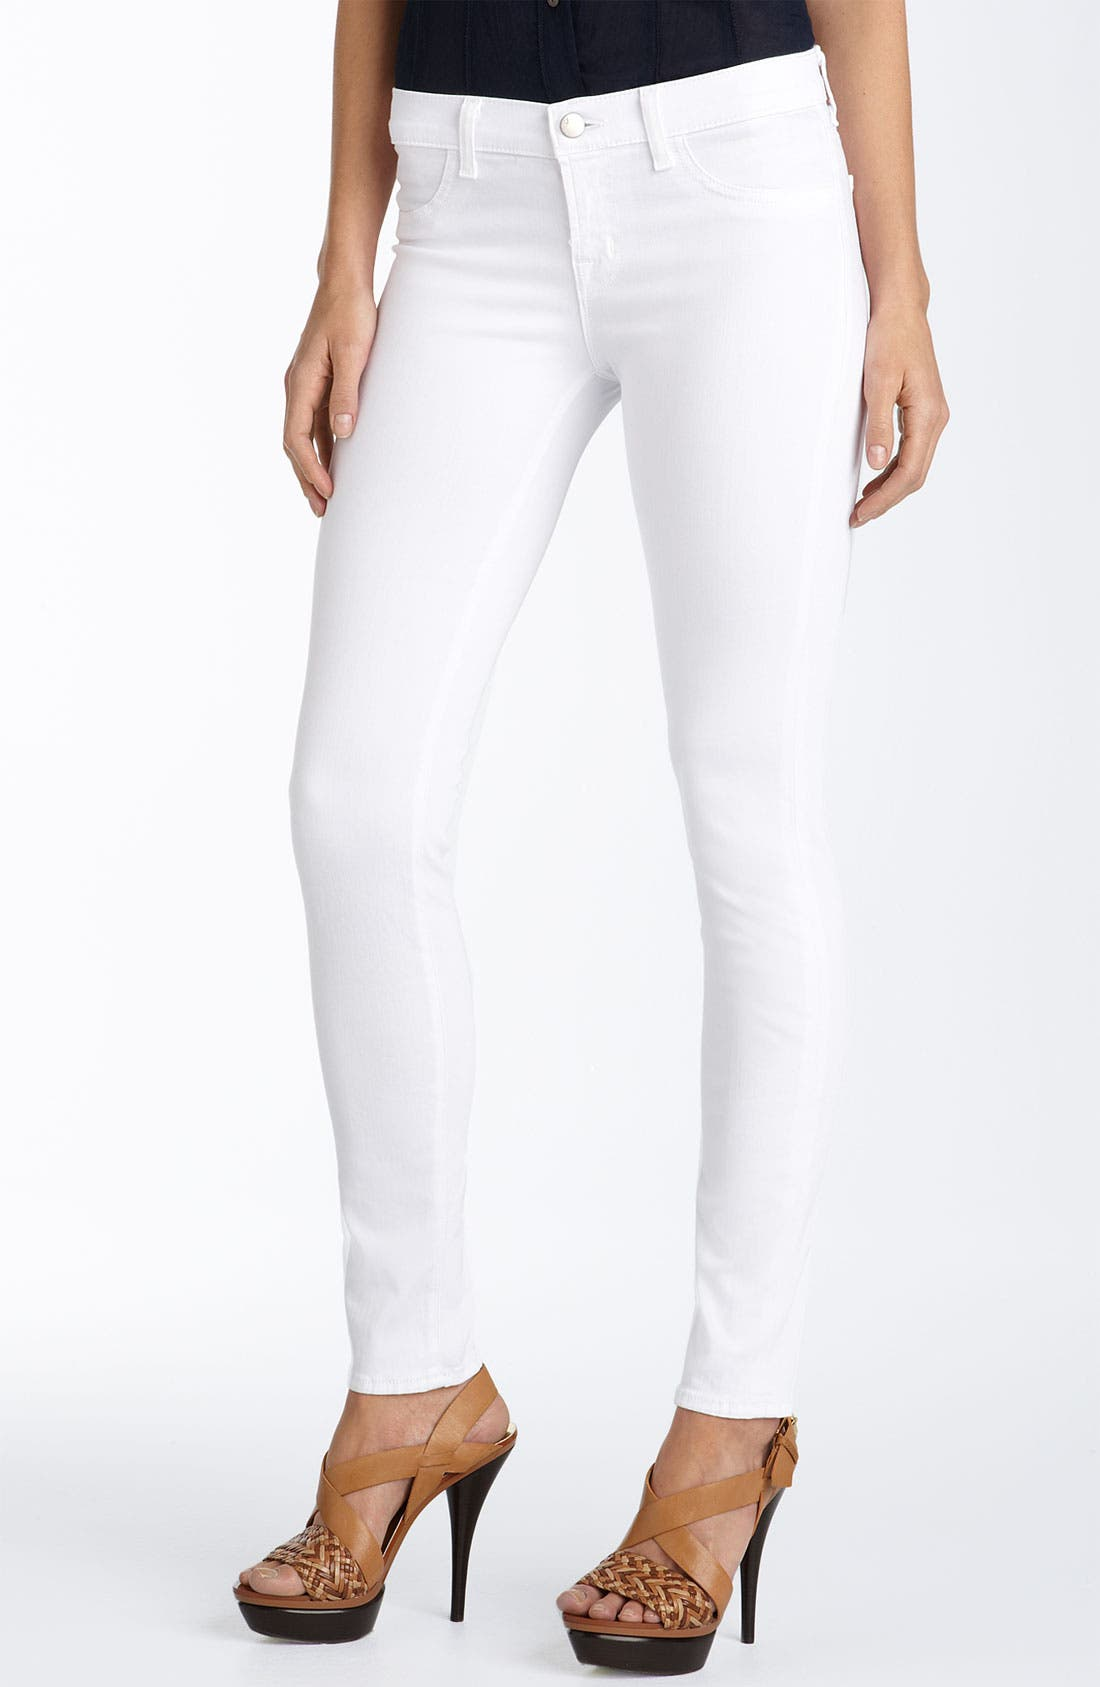 Alternate Image 1 Selected - J Brand Stretch Denim Leggings (White Wash)